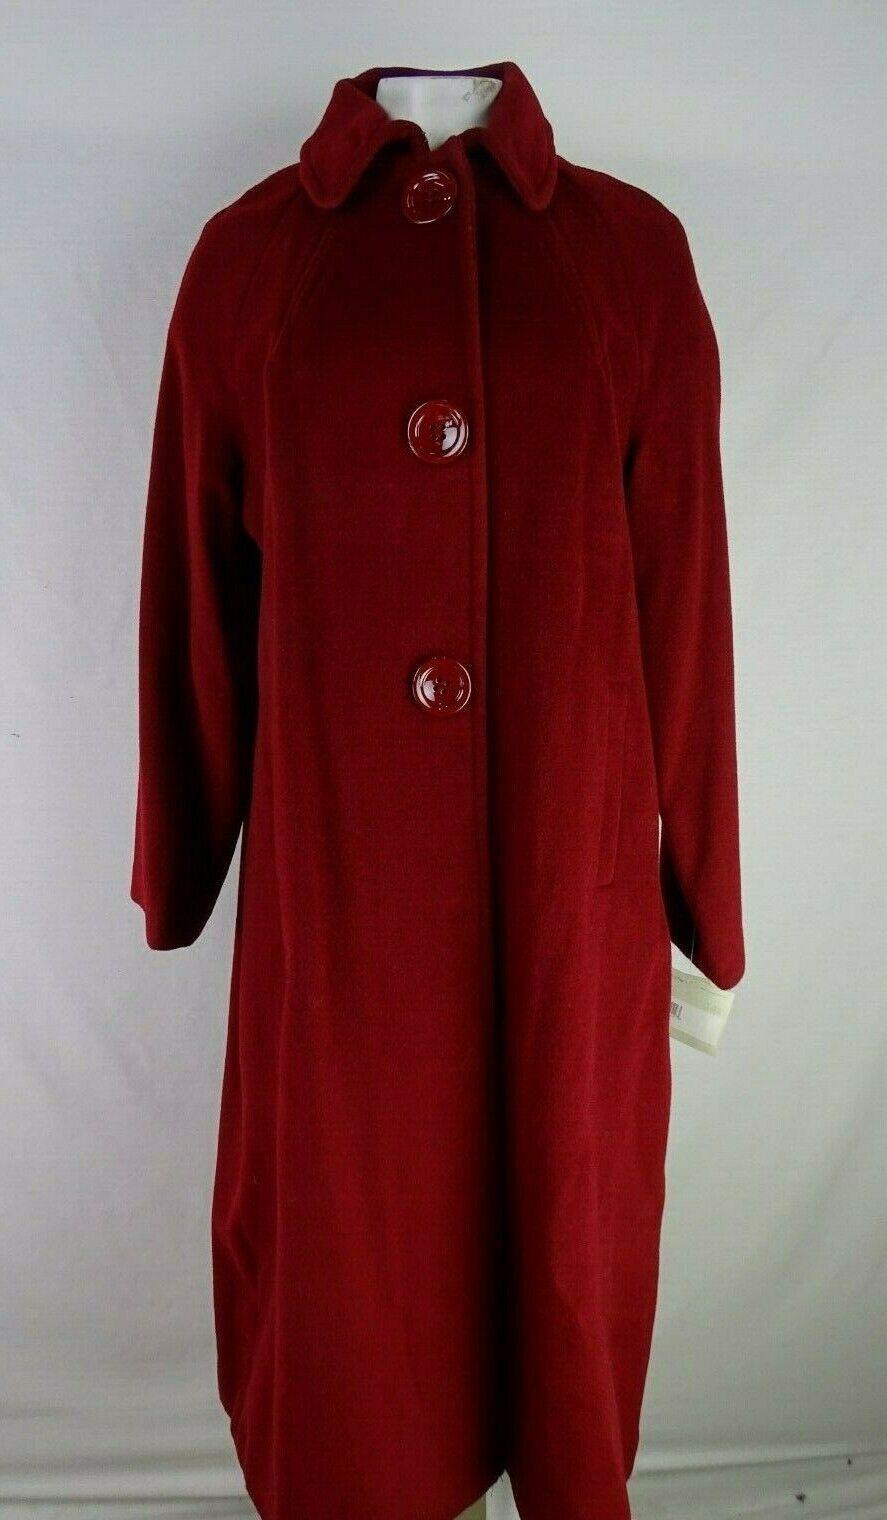 Liz Claiborne Petite Silk Wool Blend Coat Berry Red